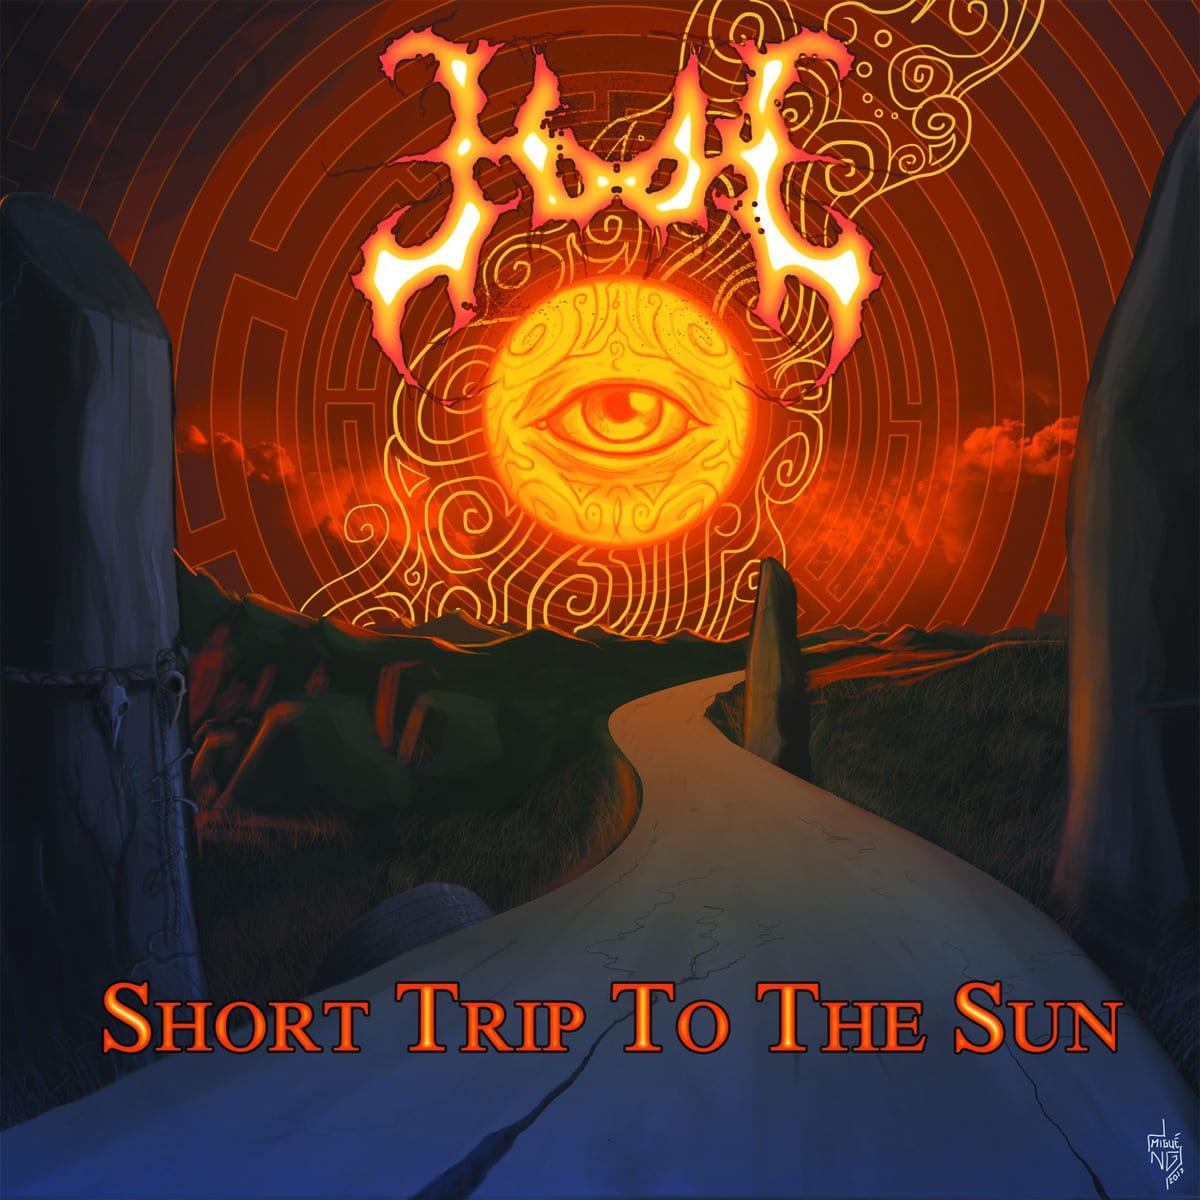 MOOR – Short trip to the sun, 2017